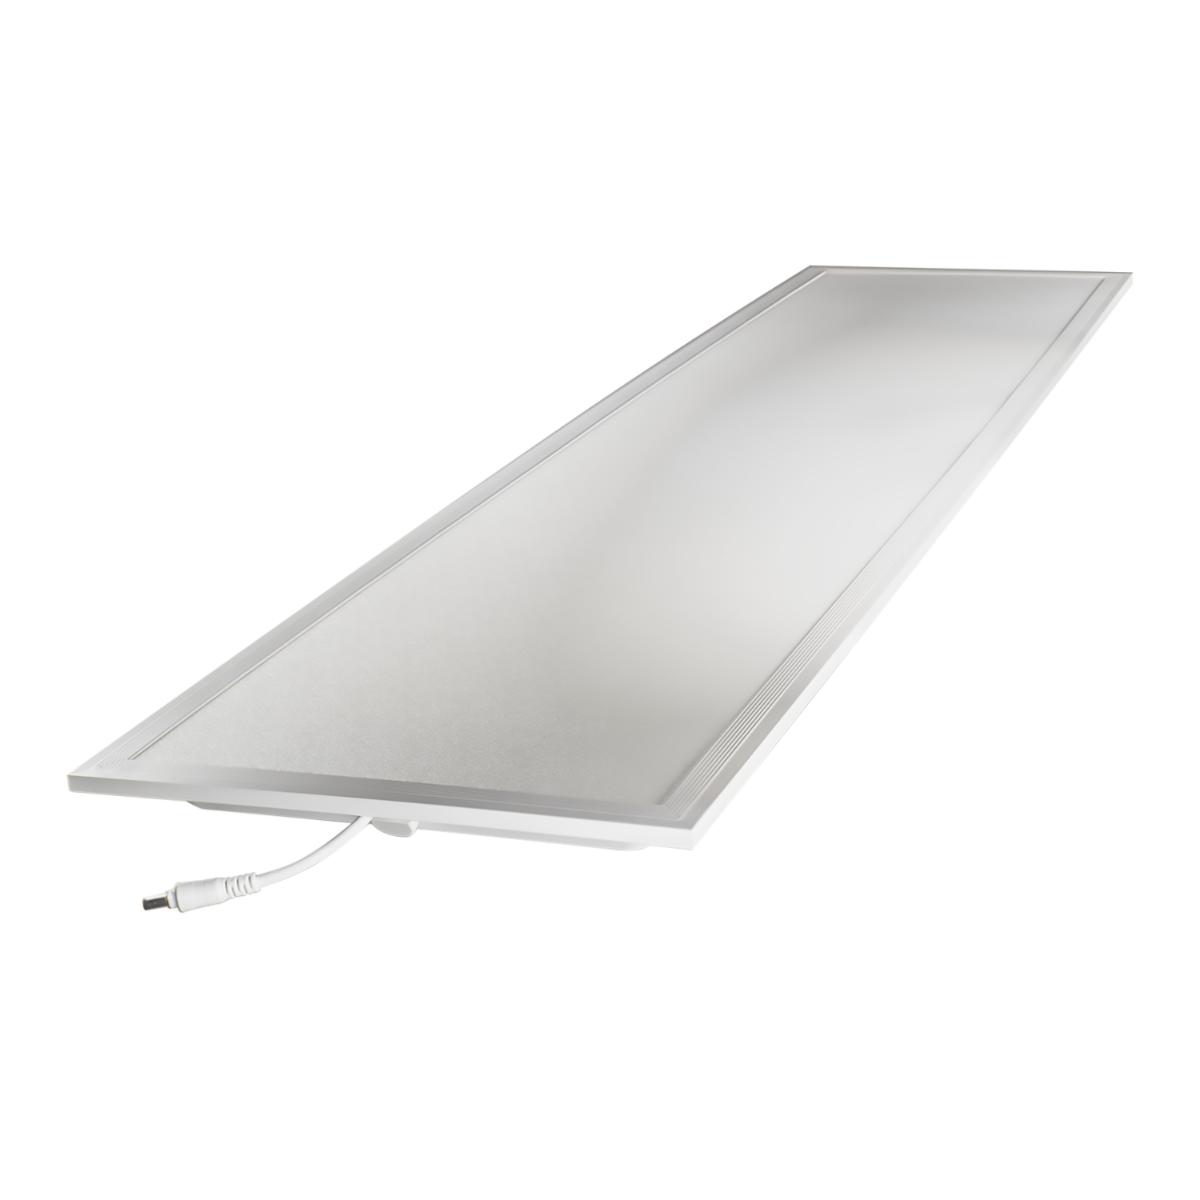 Noxion LED Panel Econox 32W Xitanium DALI 30x120cm 4000K 4400lm UGR <22   Dali Dimmable - Replacer for 2x36W